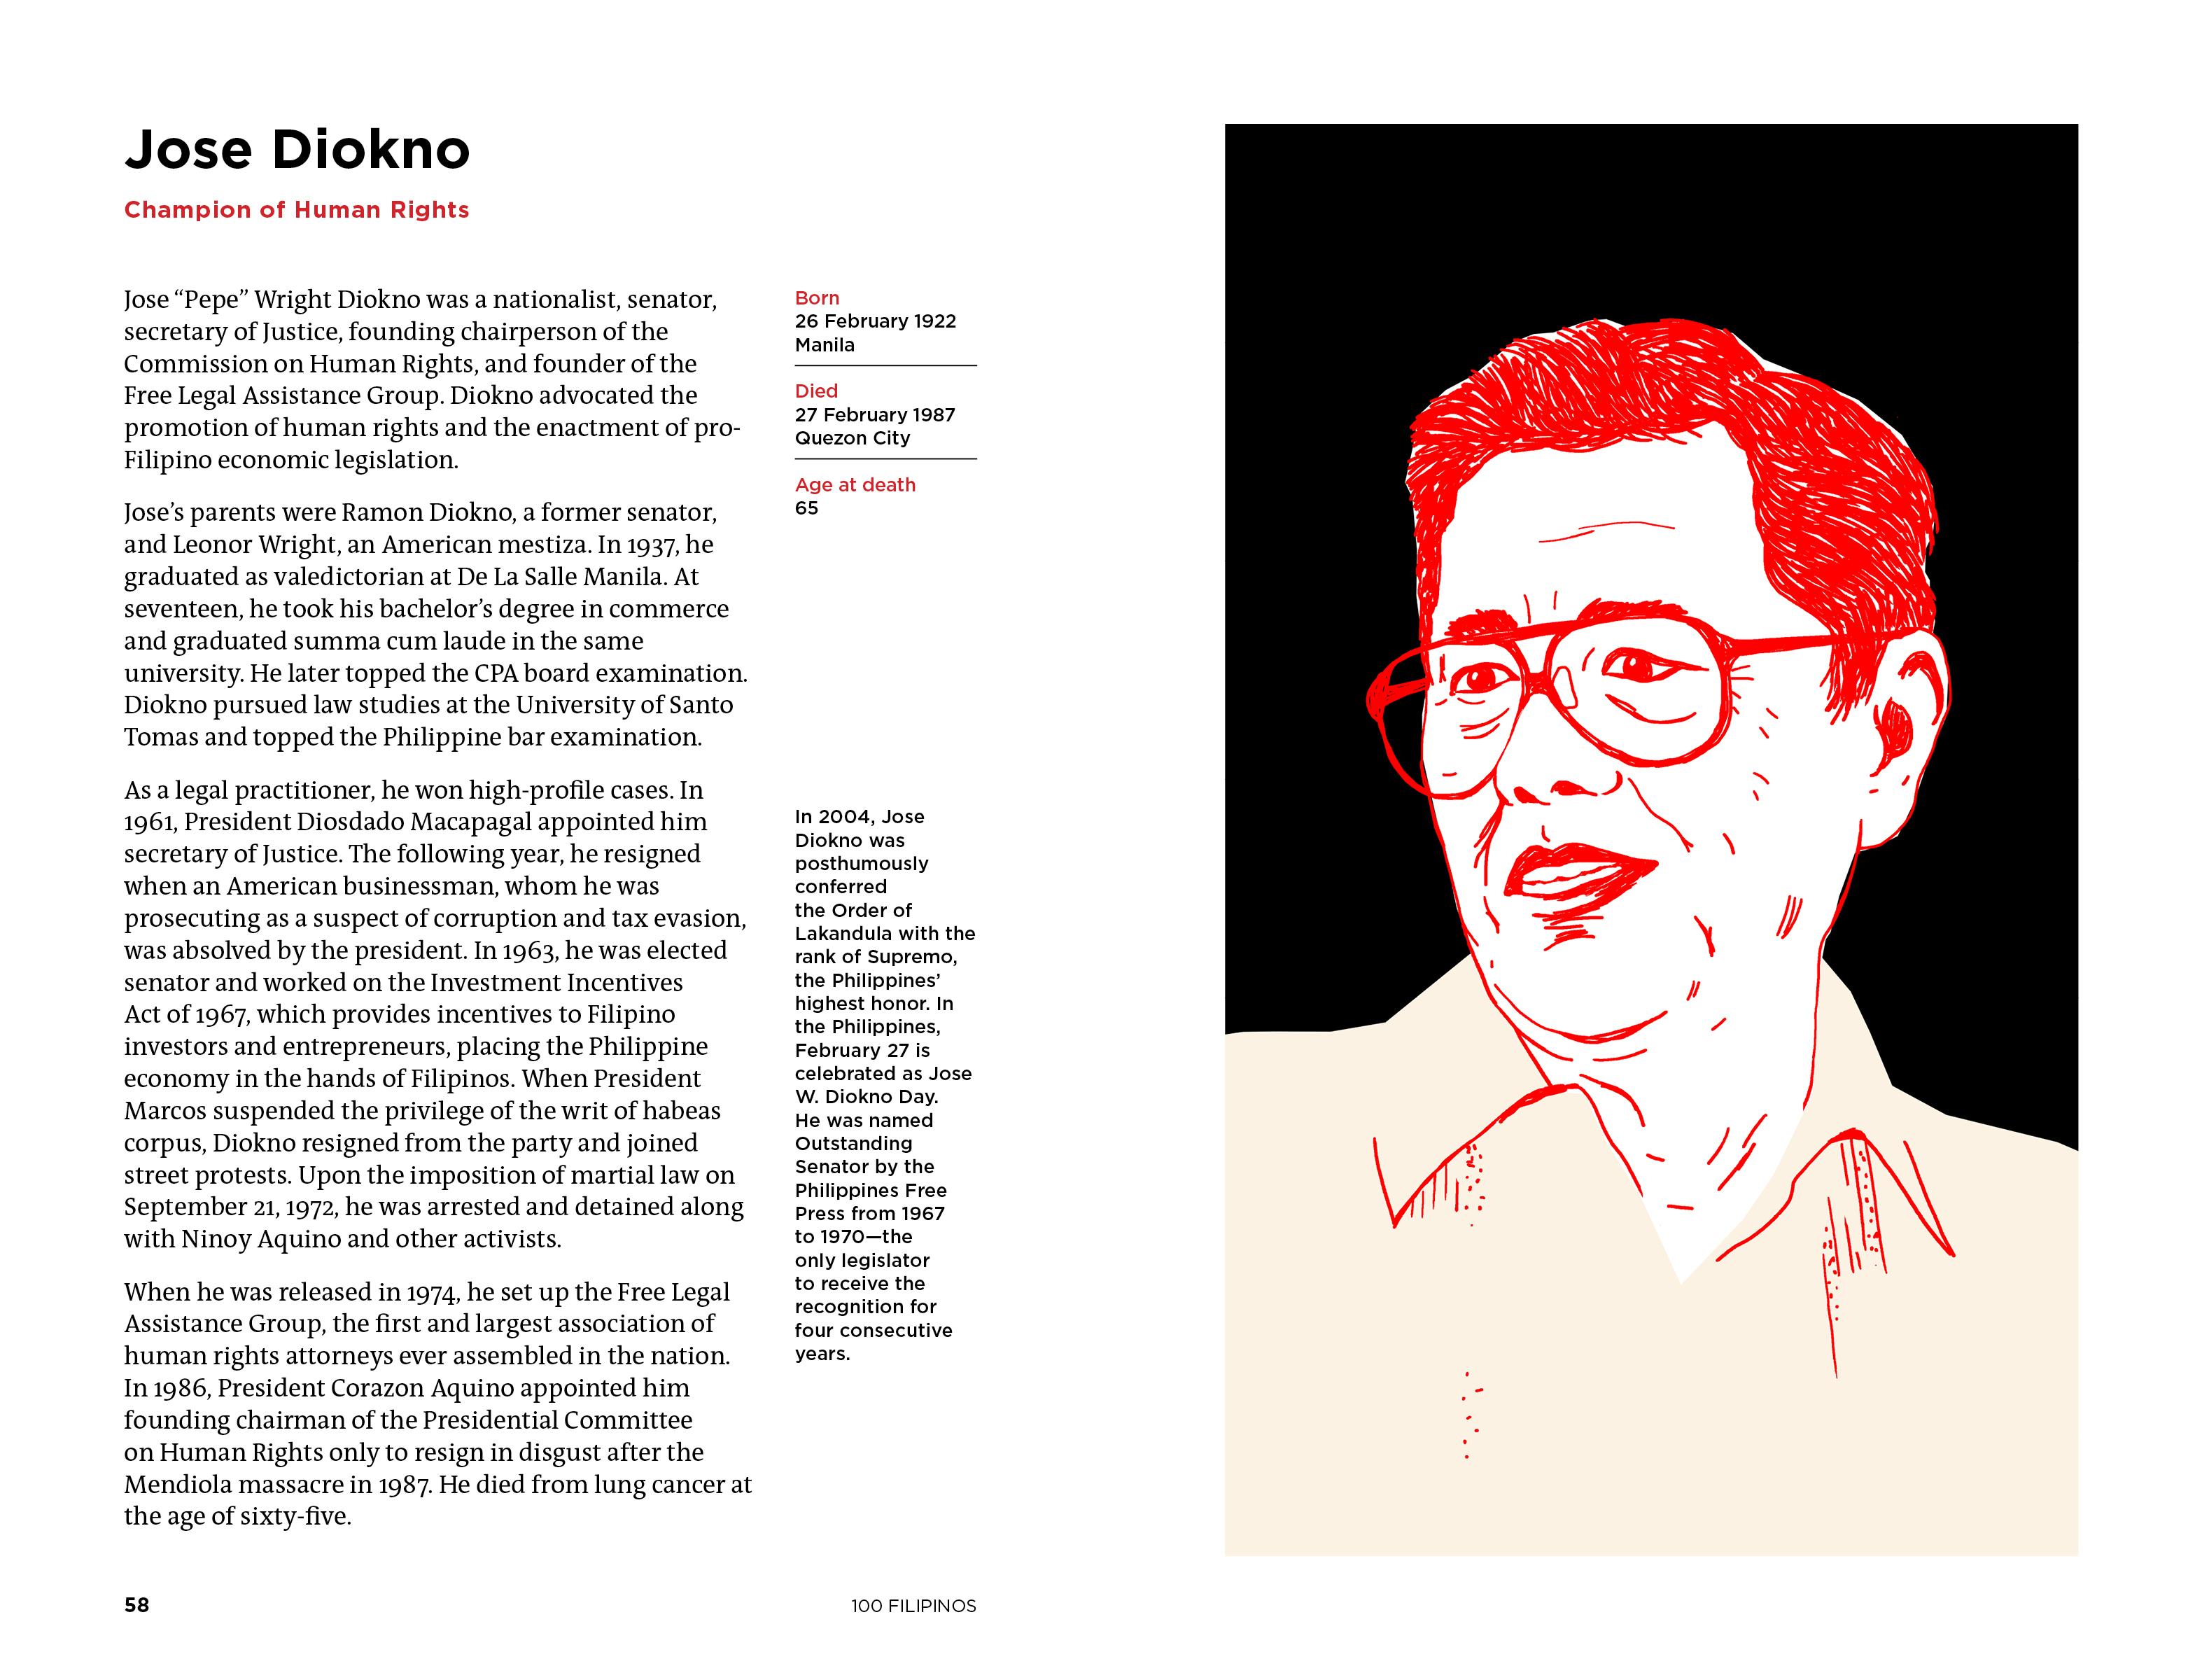 Jose Diokno illustration